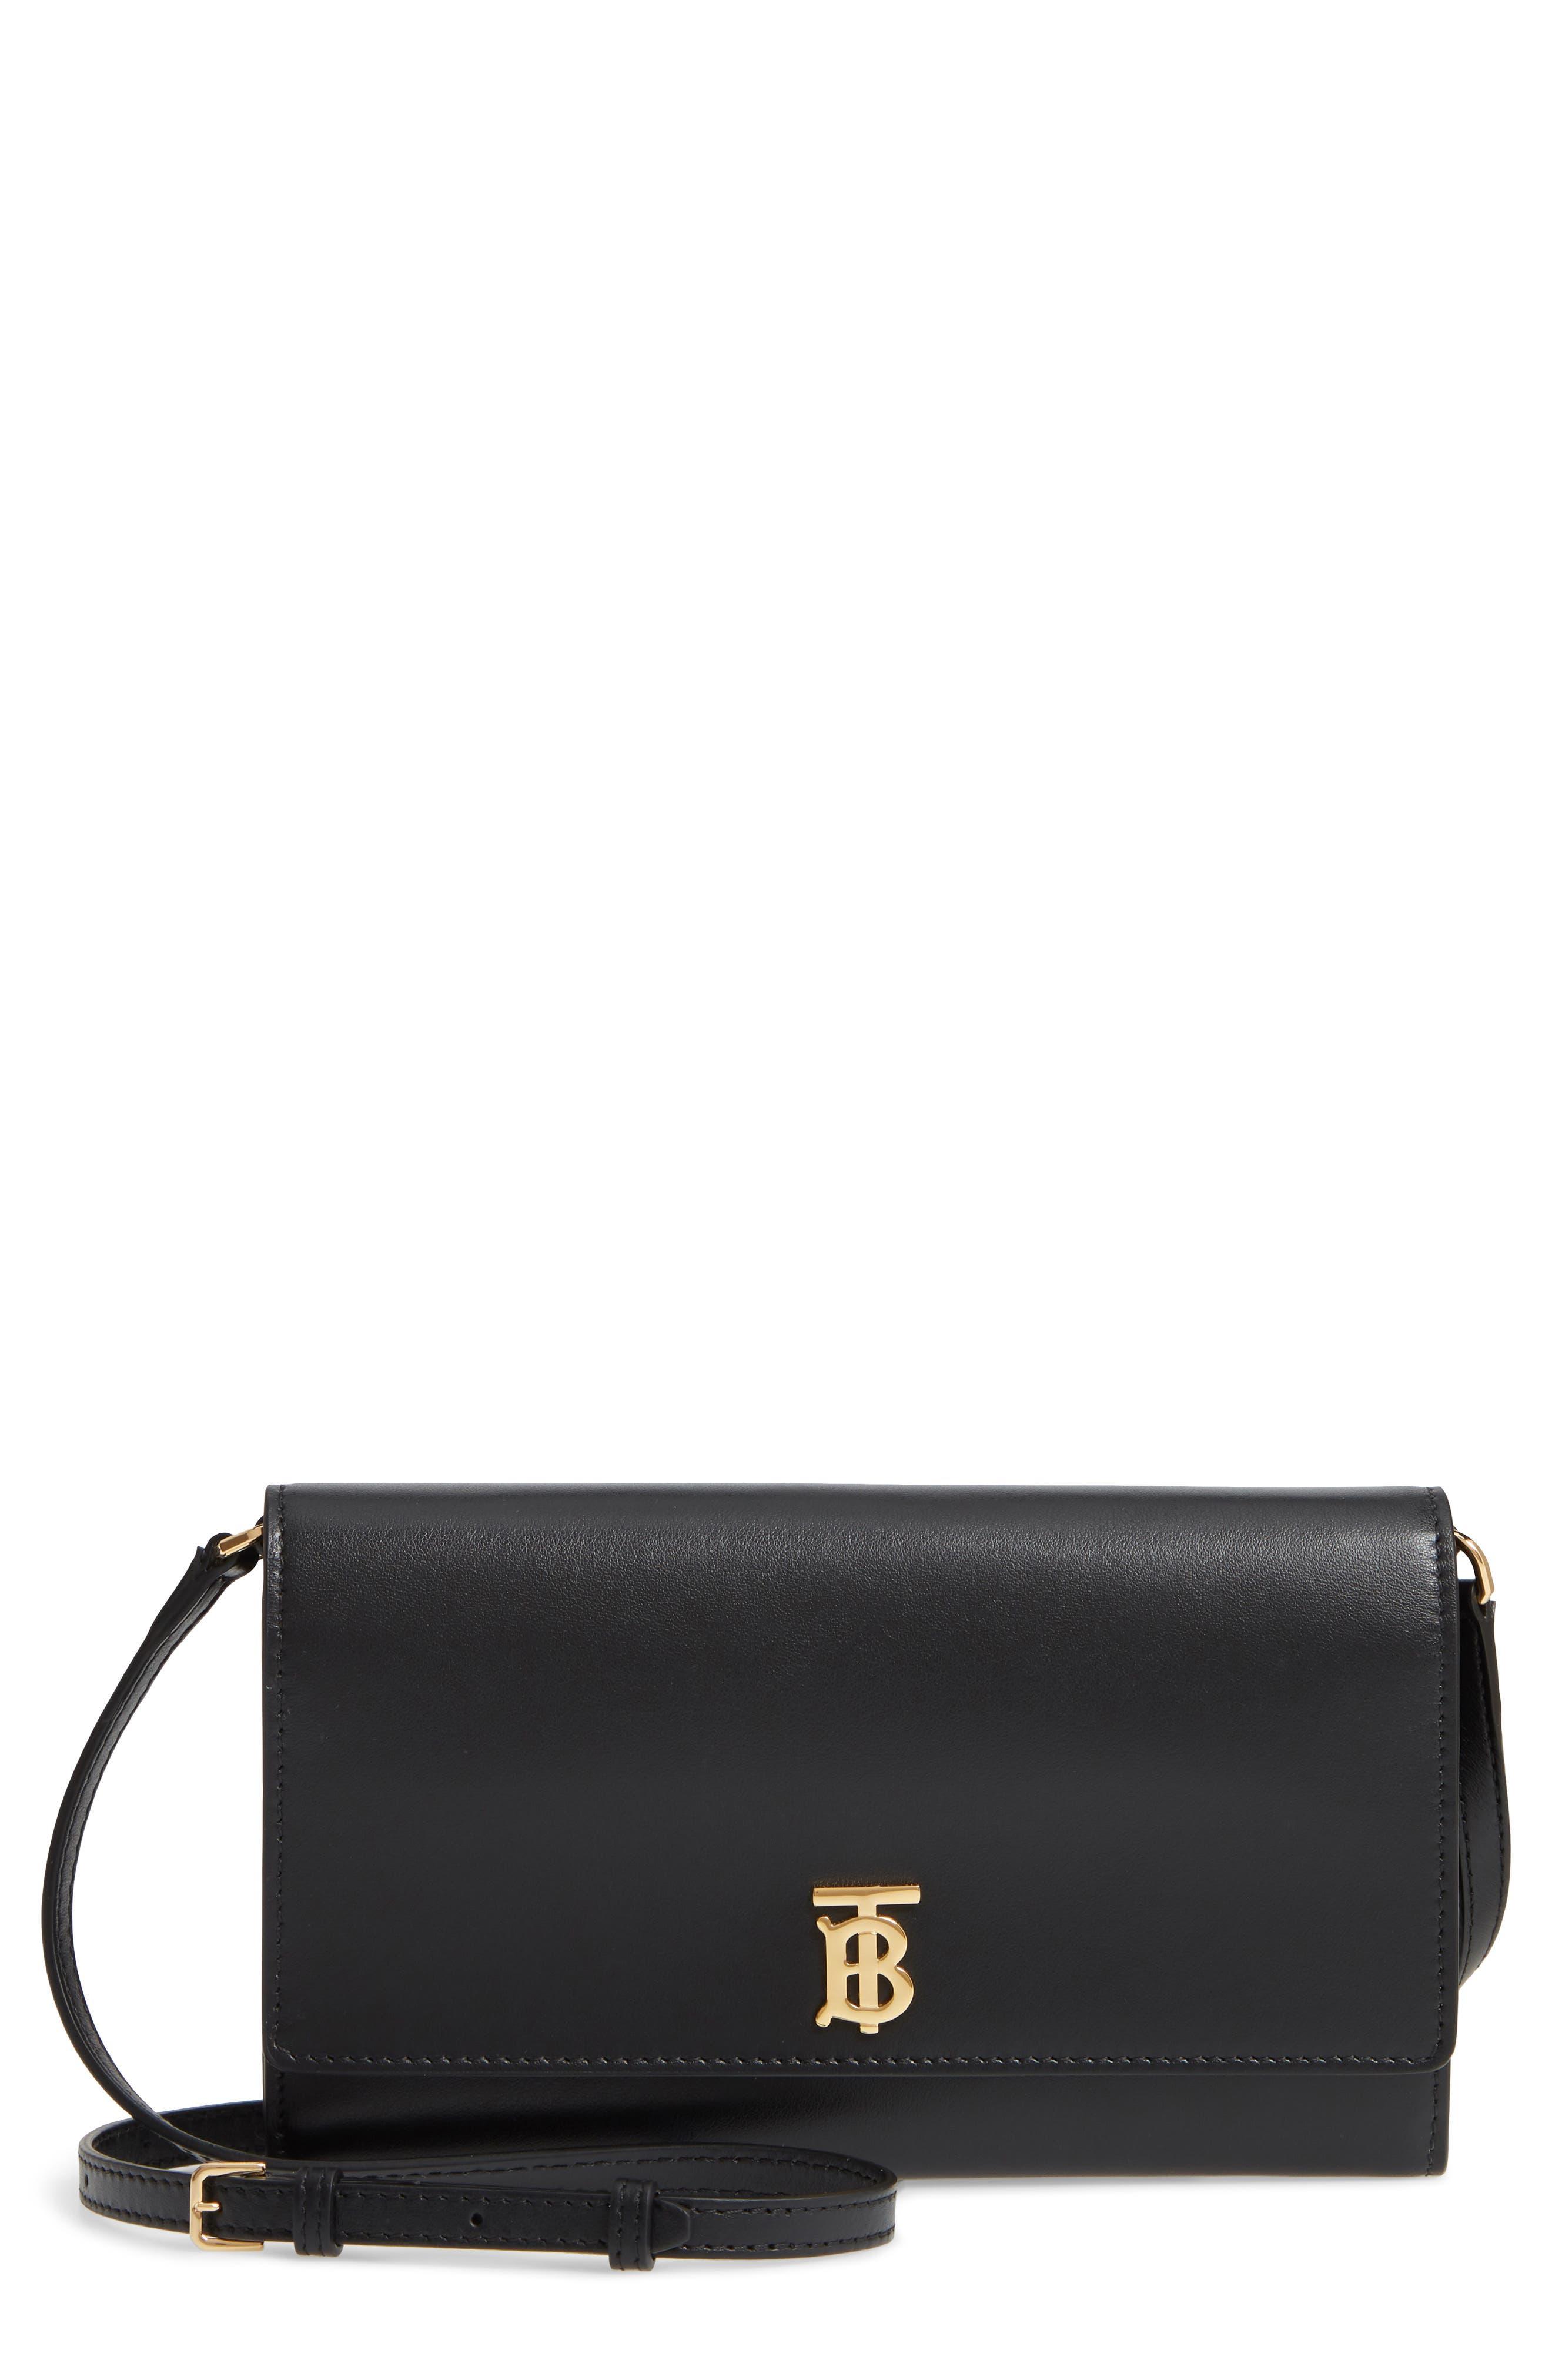 BURBERRY Hazelmere Leather Crossbody Wallet, Main, color, BLACK